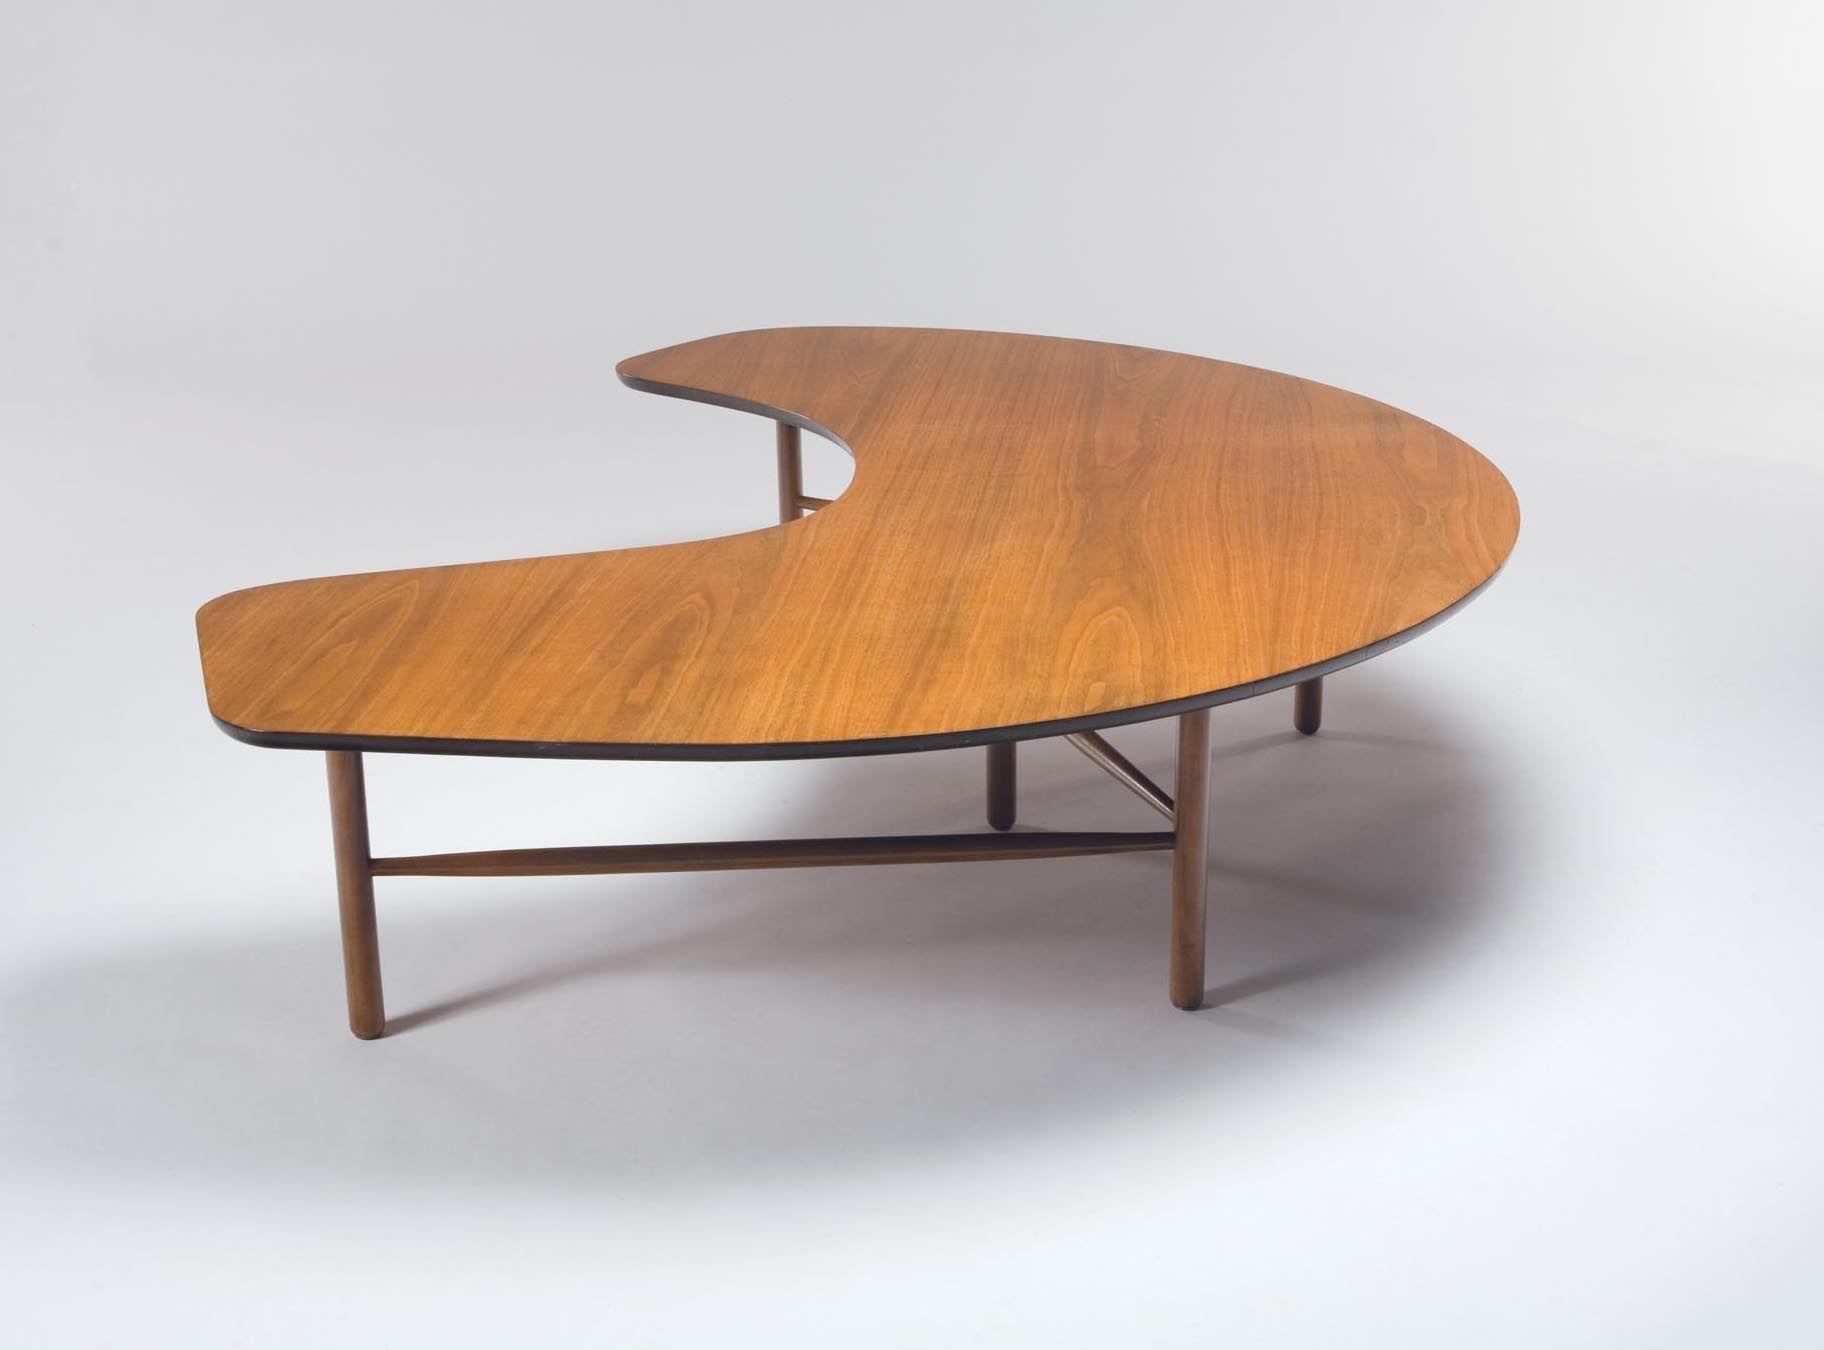 Coffee table designed by swedish american designer greta coffee table designed by swedish american designer greta magnusson grossman for glenn of california geotapseo Gallery